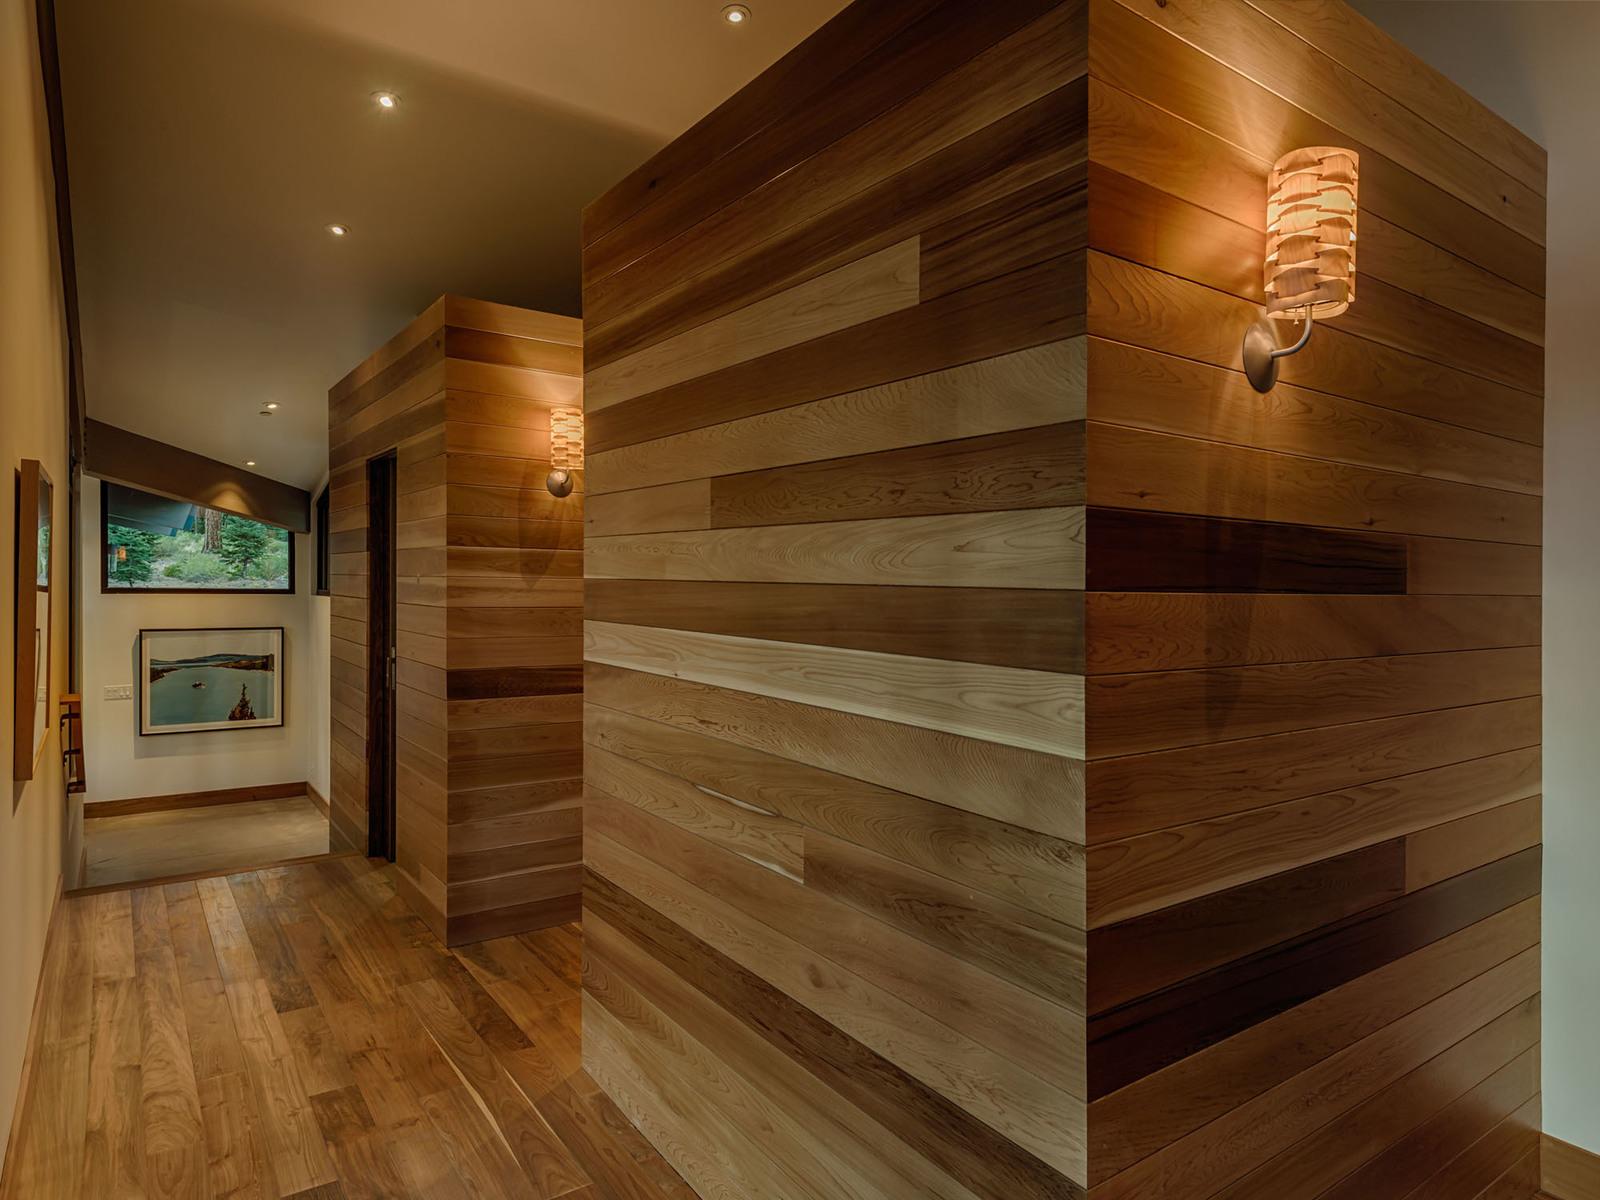 wood-paneling_s600.jpg